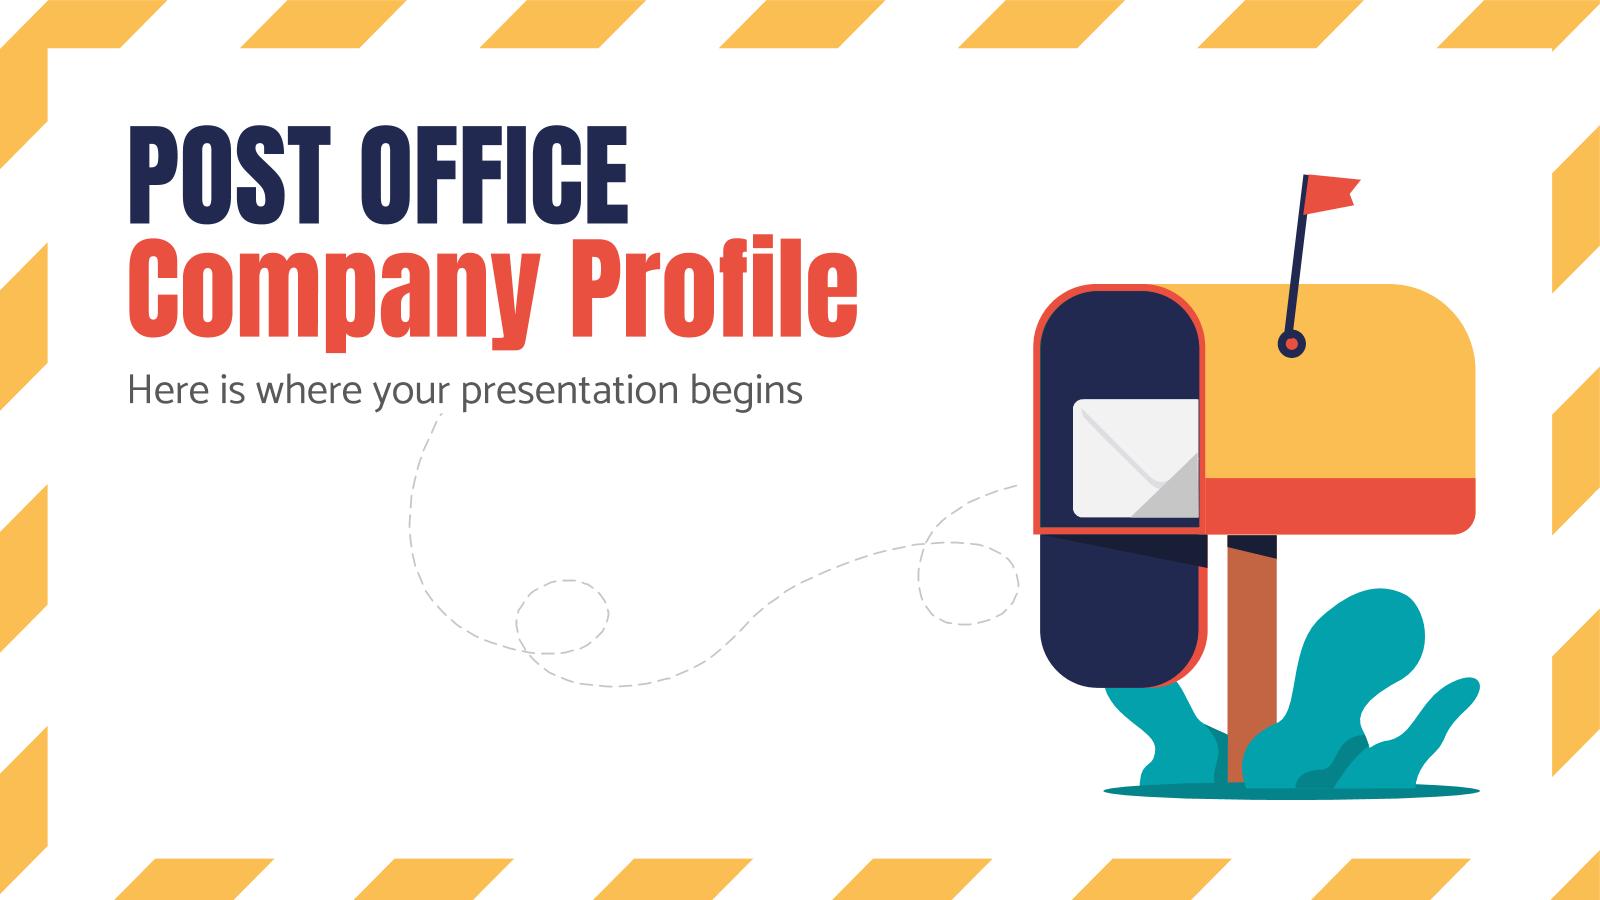 Post Office Company Profile presentation template